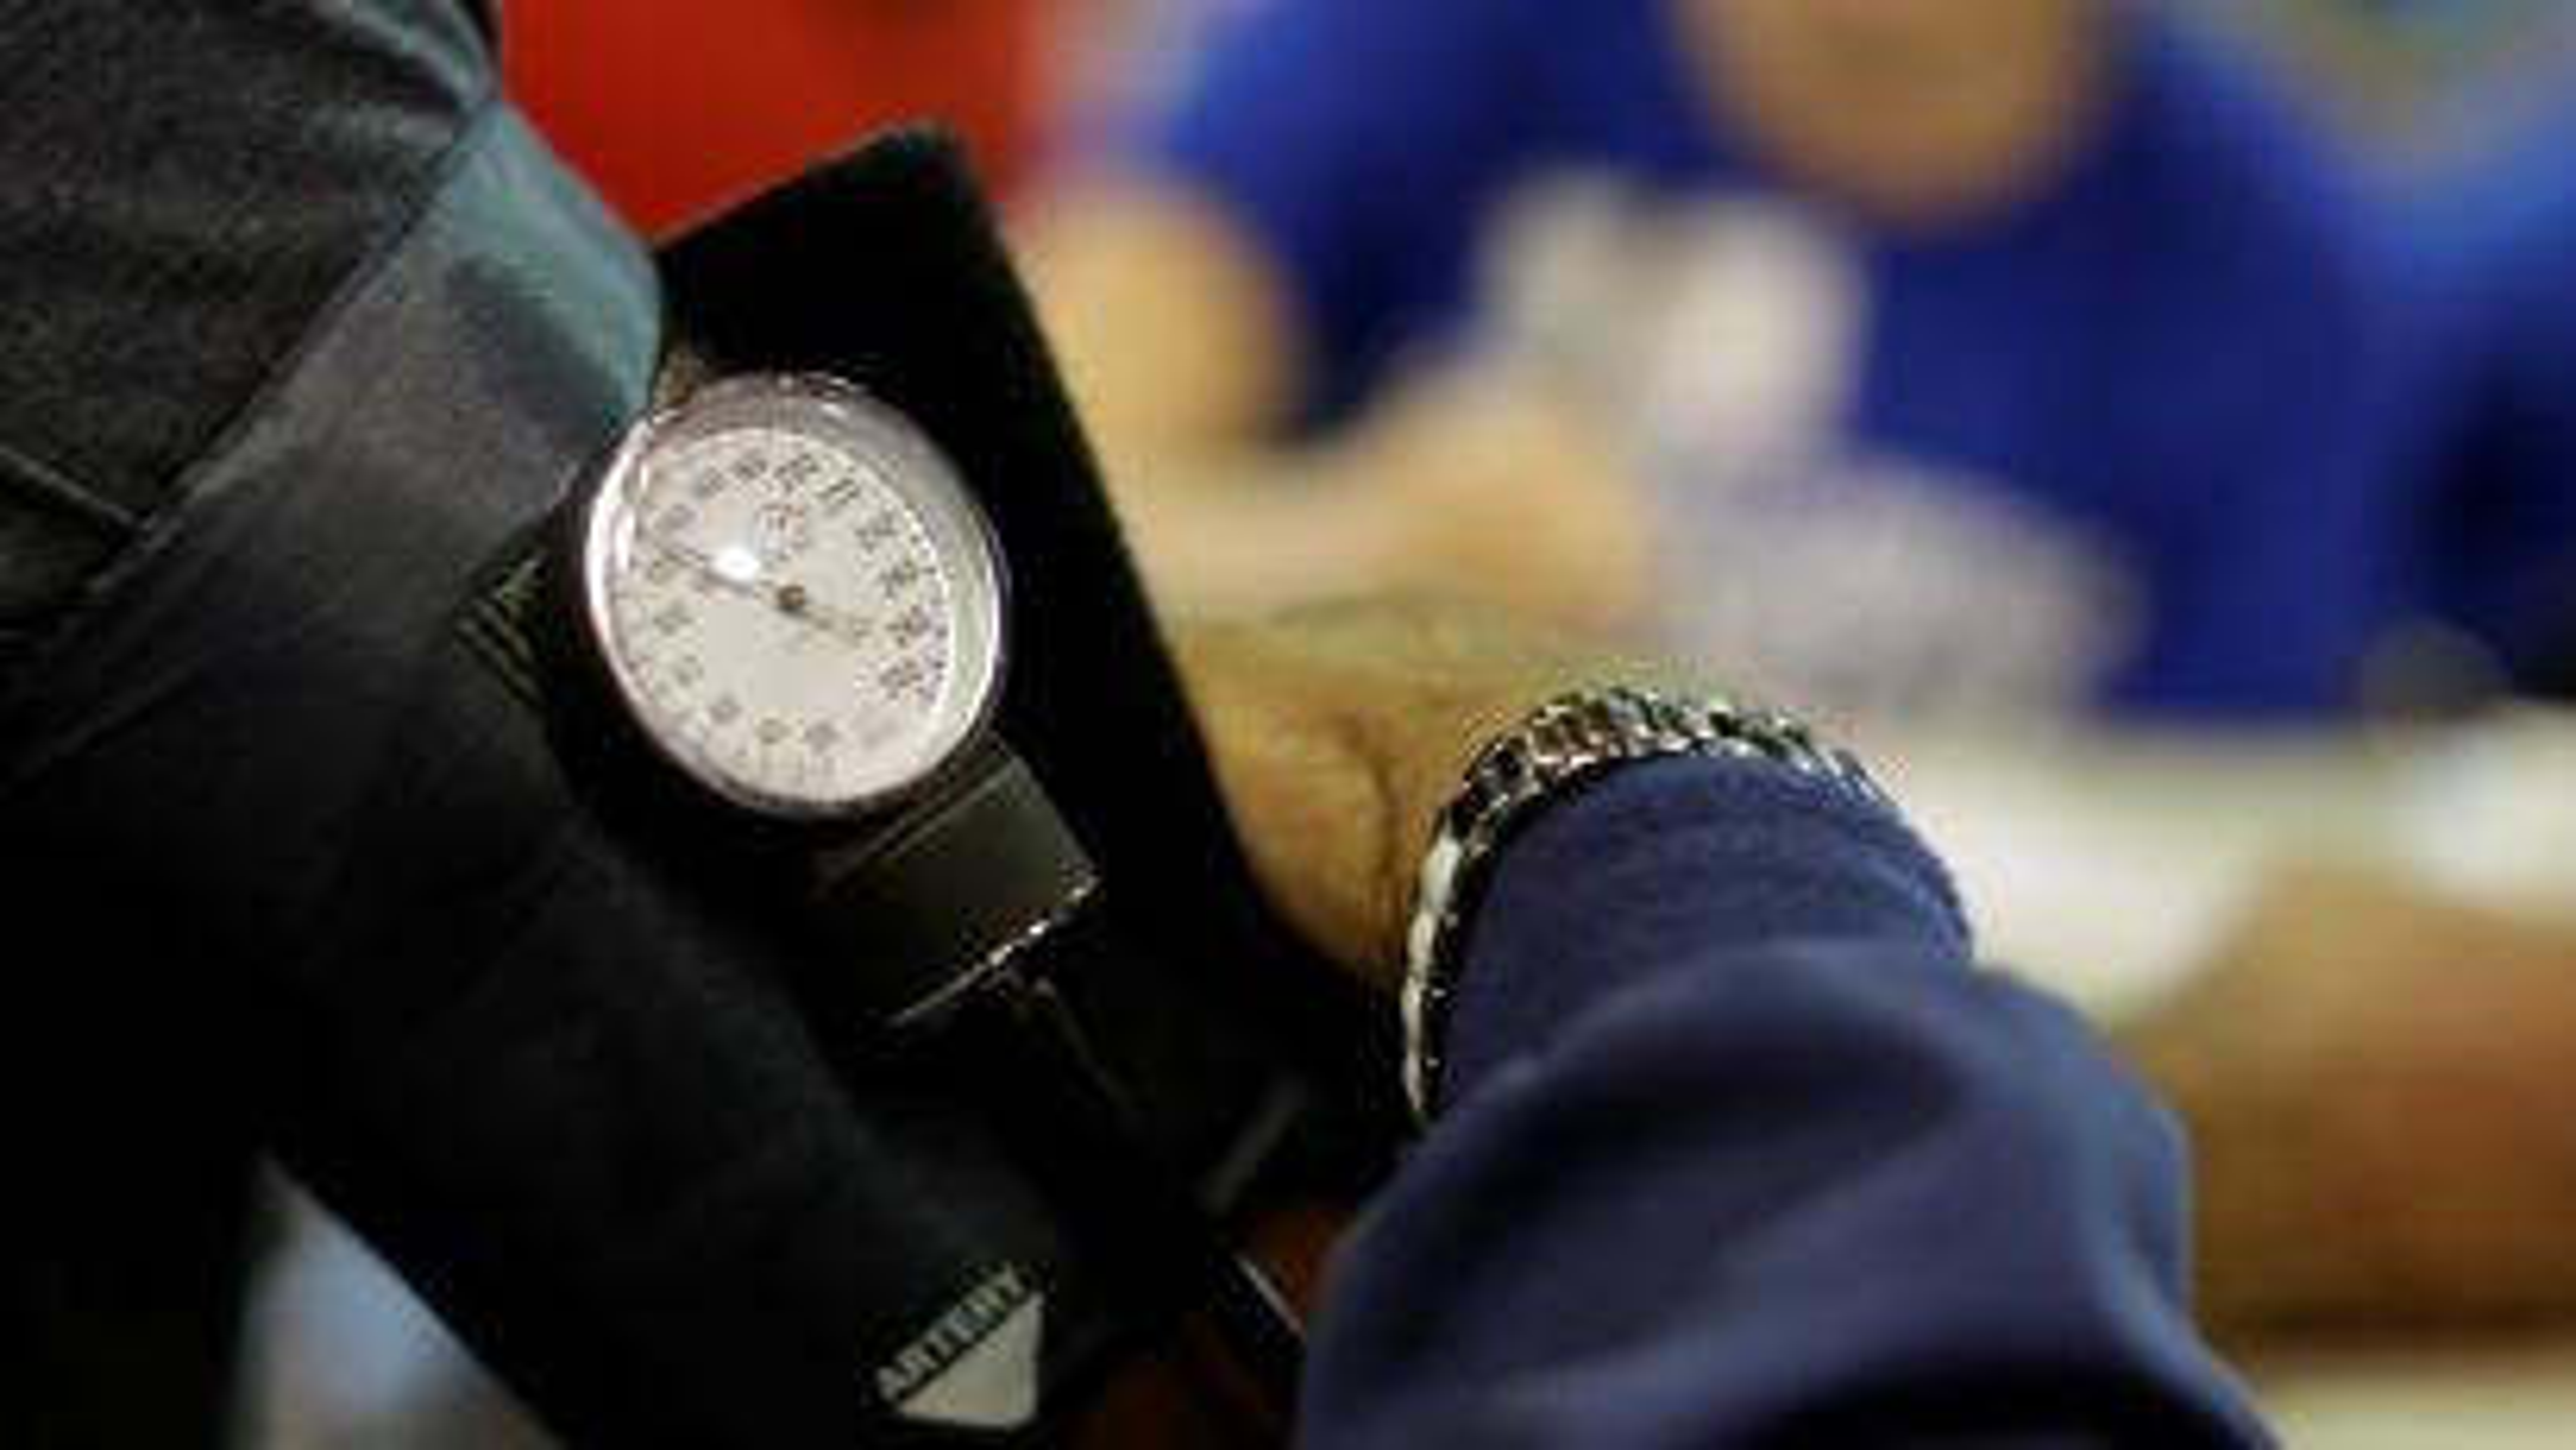 A man getting his blood pressure taken.